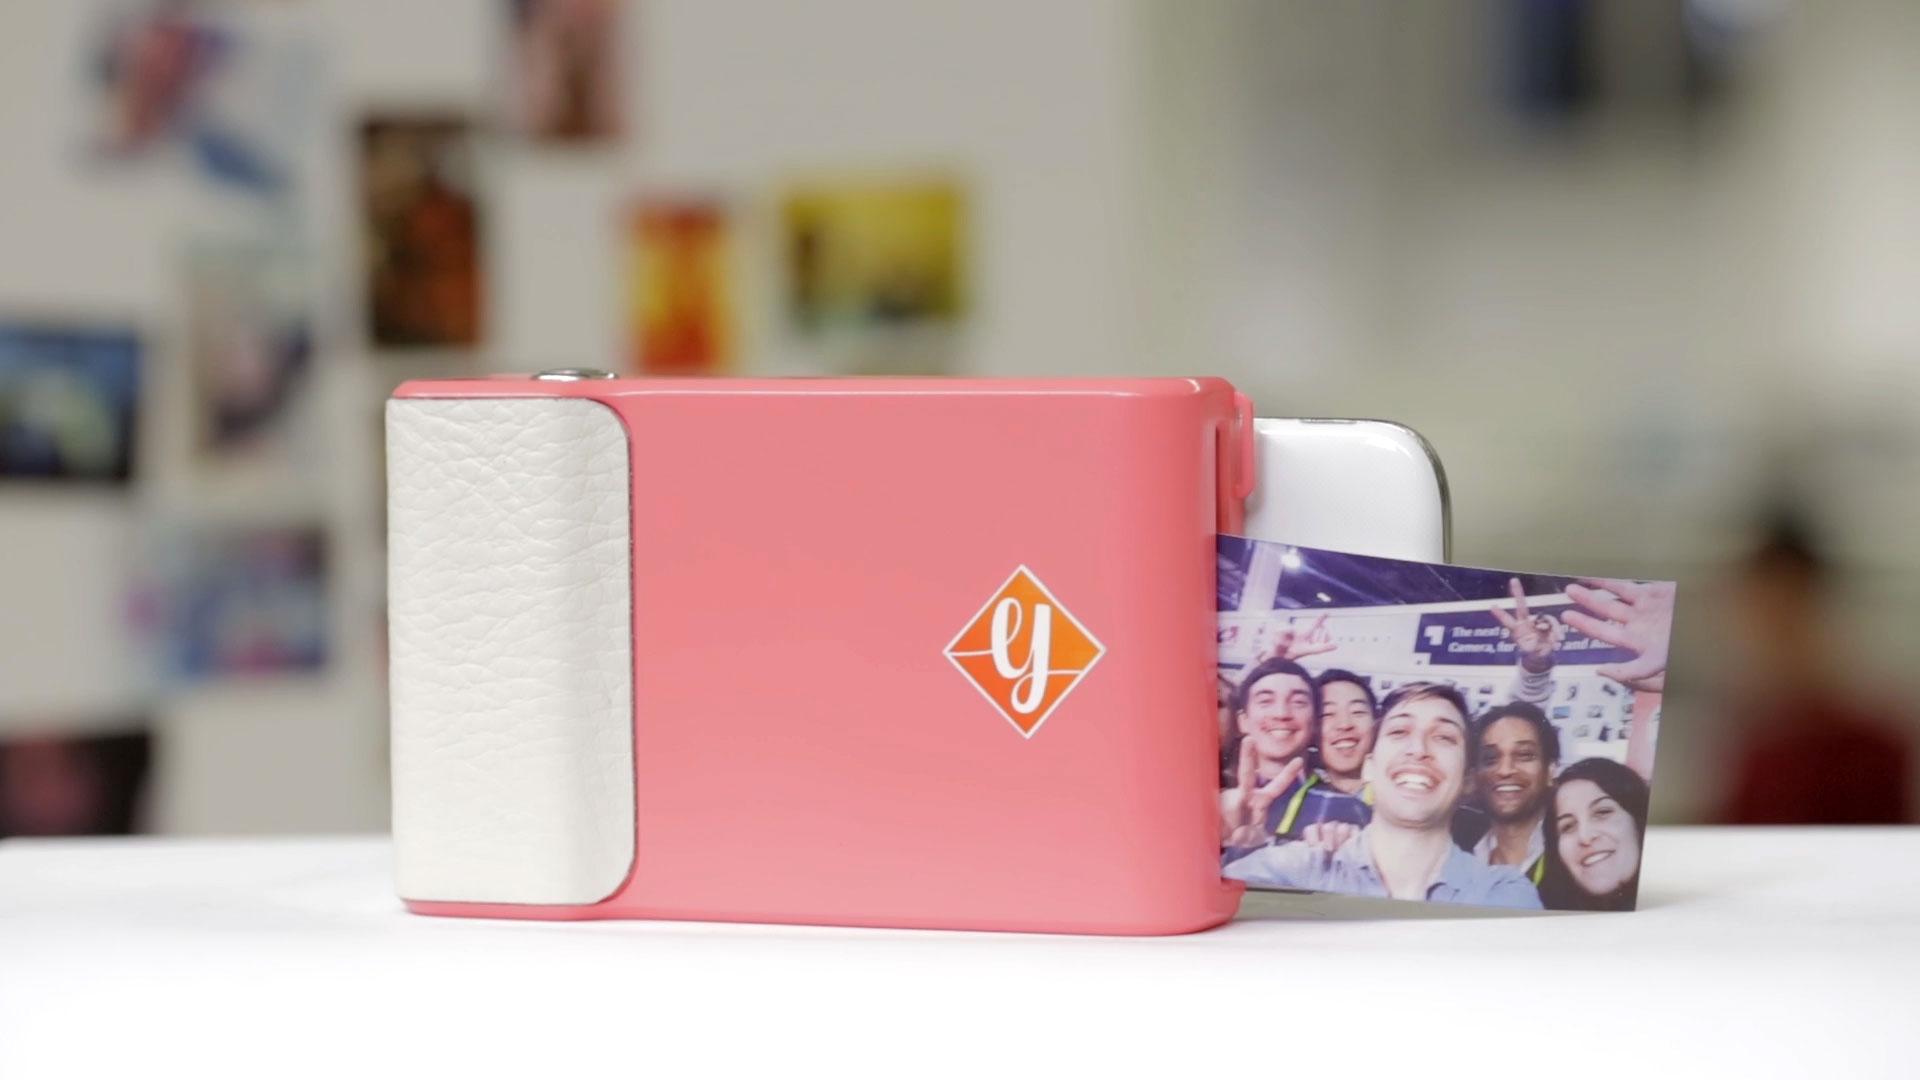 Photo of Prynt: Husa pentru telefon cu imprimanta incorporata